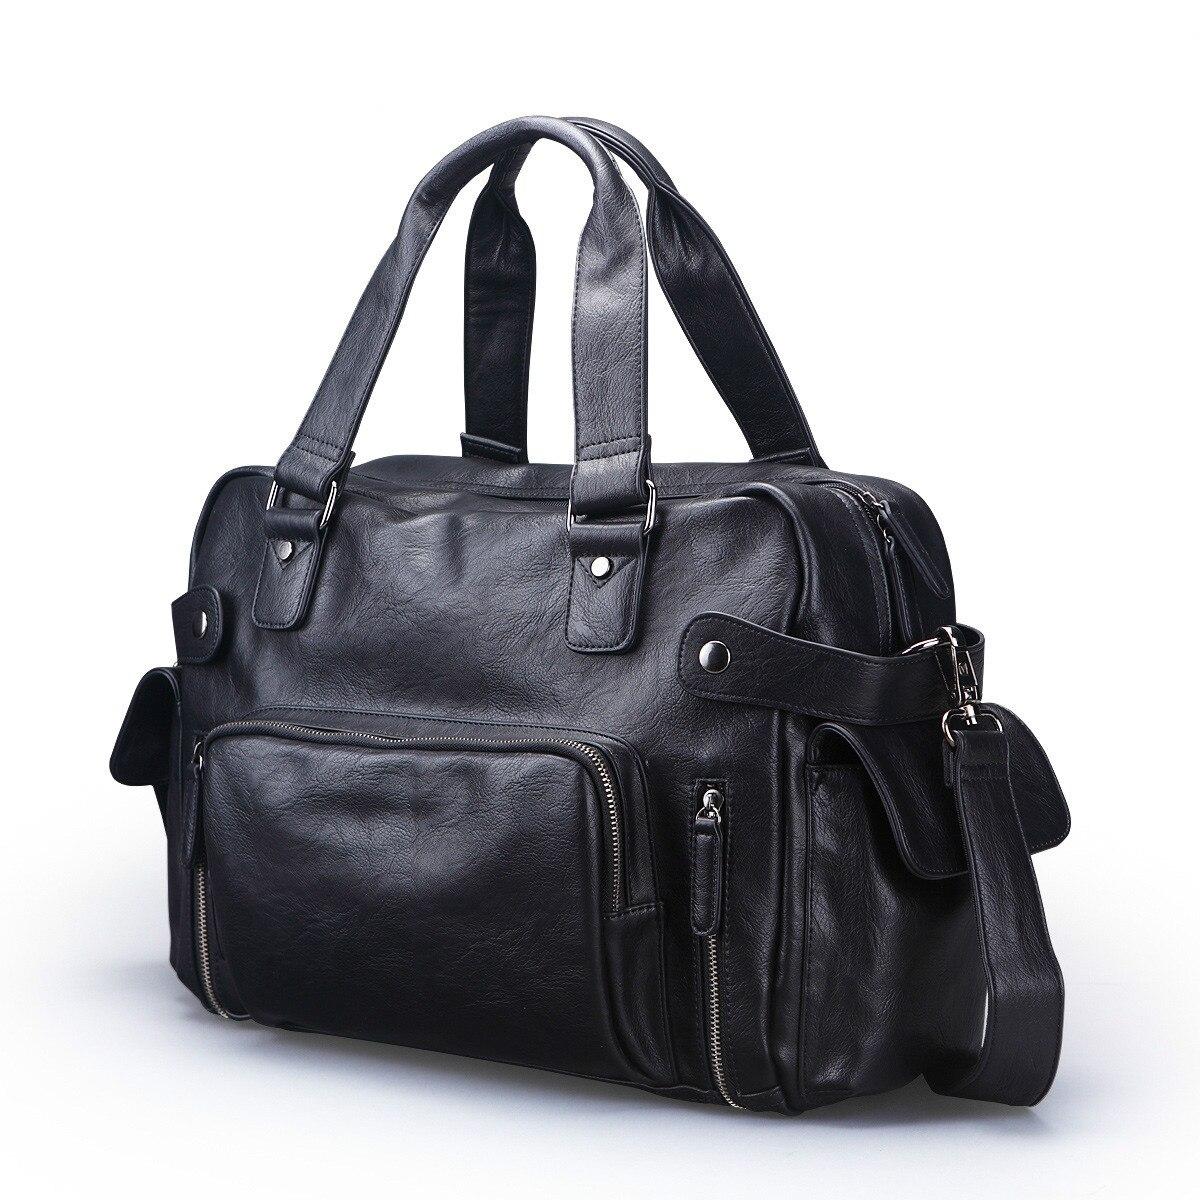 2017 Genuine Leather bag Business Men bags Laptop Tote Briefcases Crossbody bags Shoulder Handbag Men's Messenger Bag 9103 fashion leather bag business men bags laptop tote briefcases crossbody bags shoulder handbag men s messenger bag